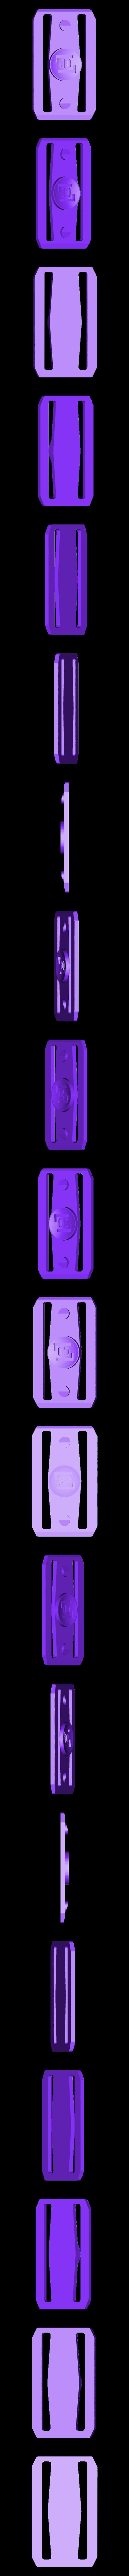 Jouet_Hotwheels_connecteur.stl Download free STL file Hot wheels connector • 3D printing model, legendredavid27